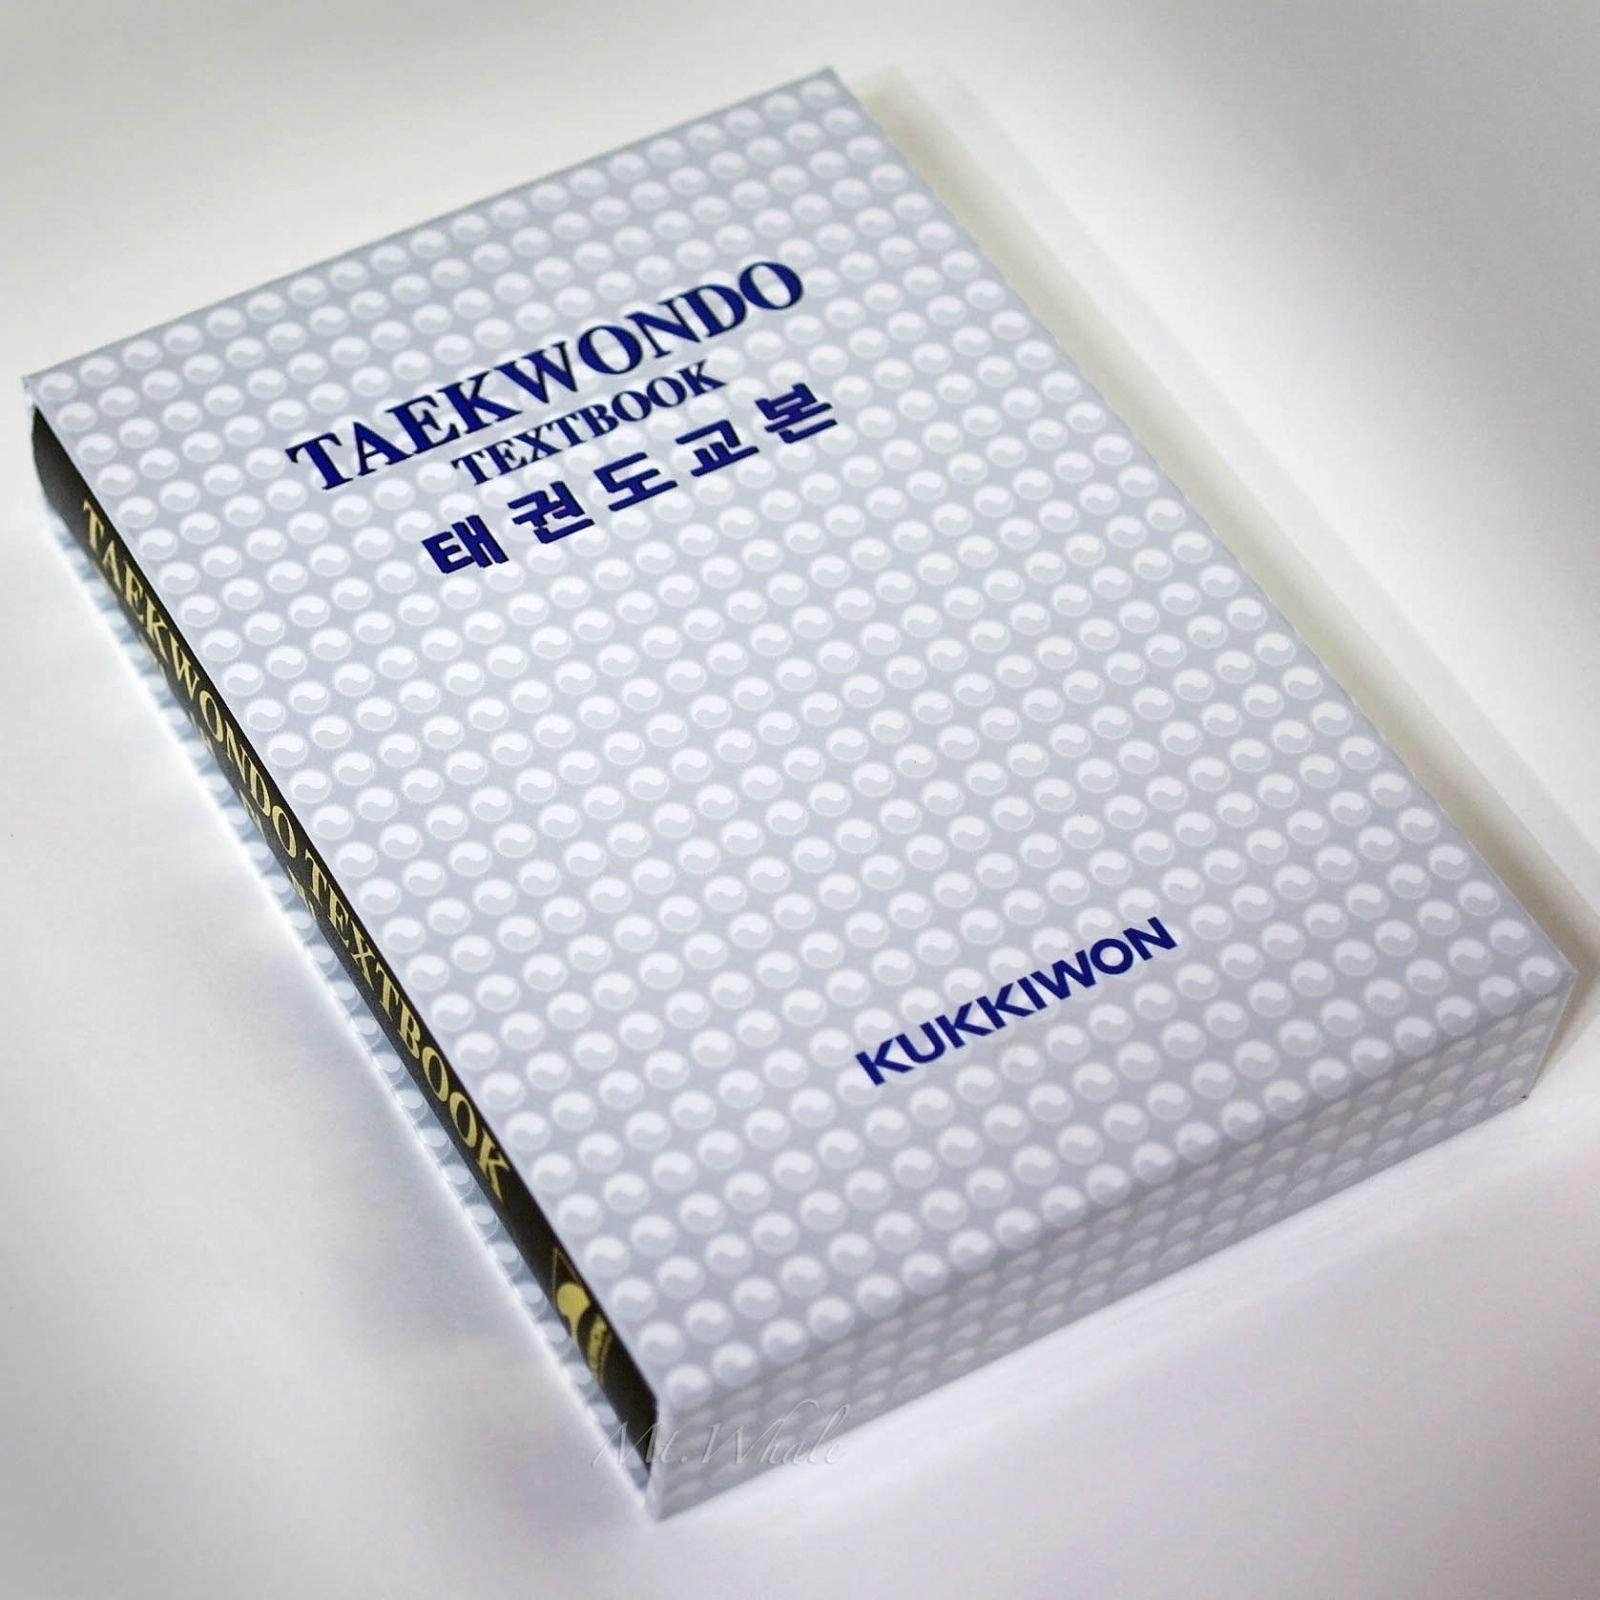 Kukkiwon digital taekwondo for android apk download.